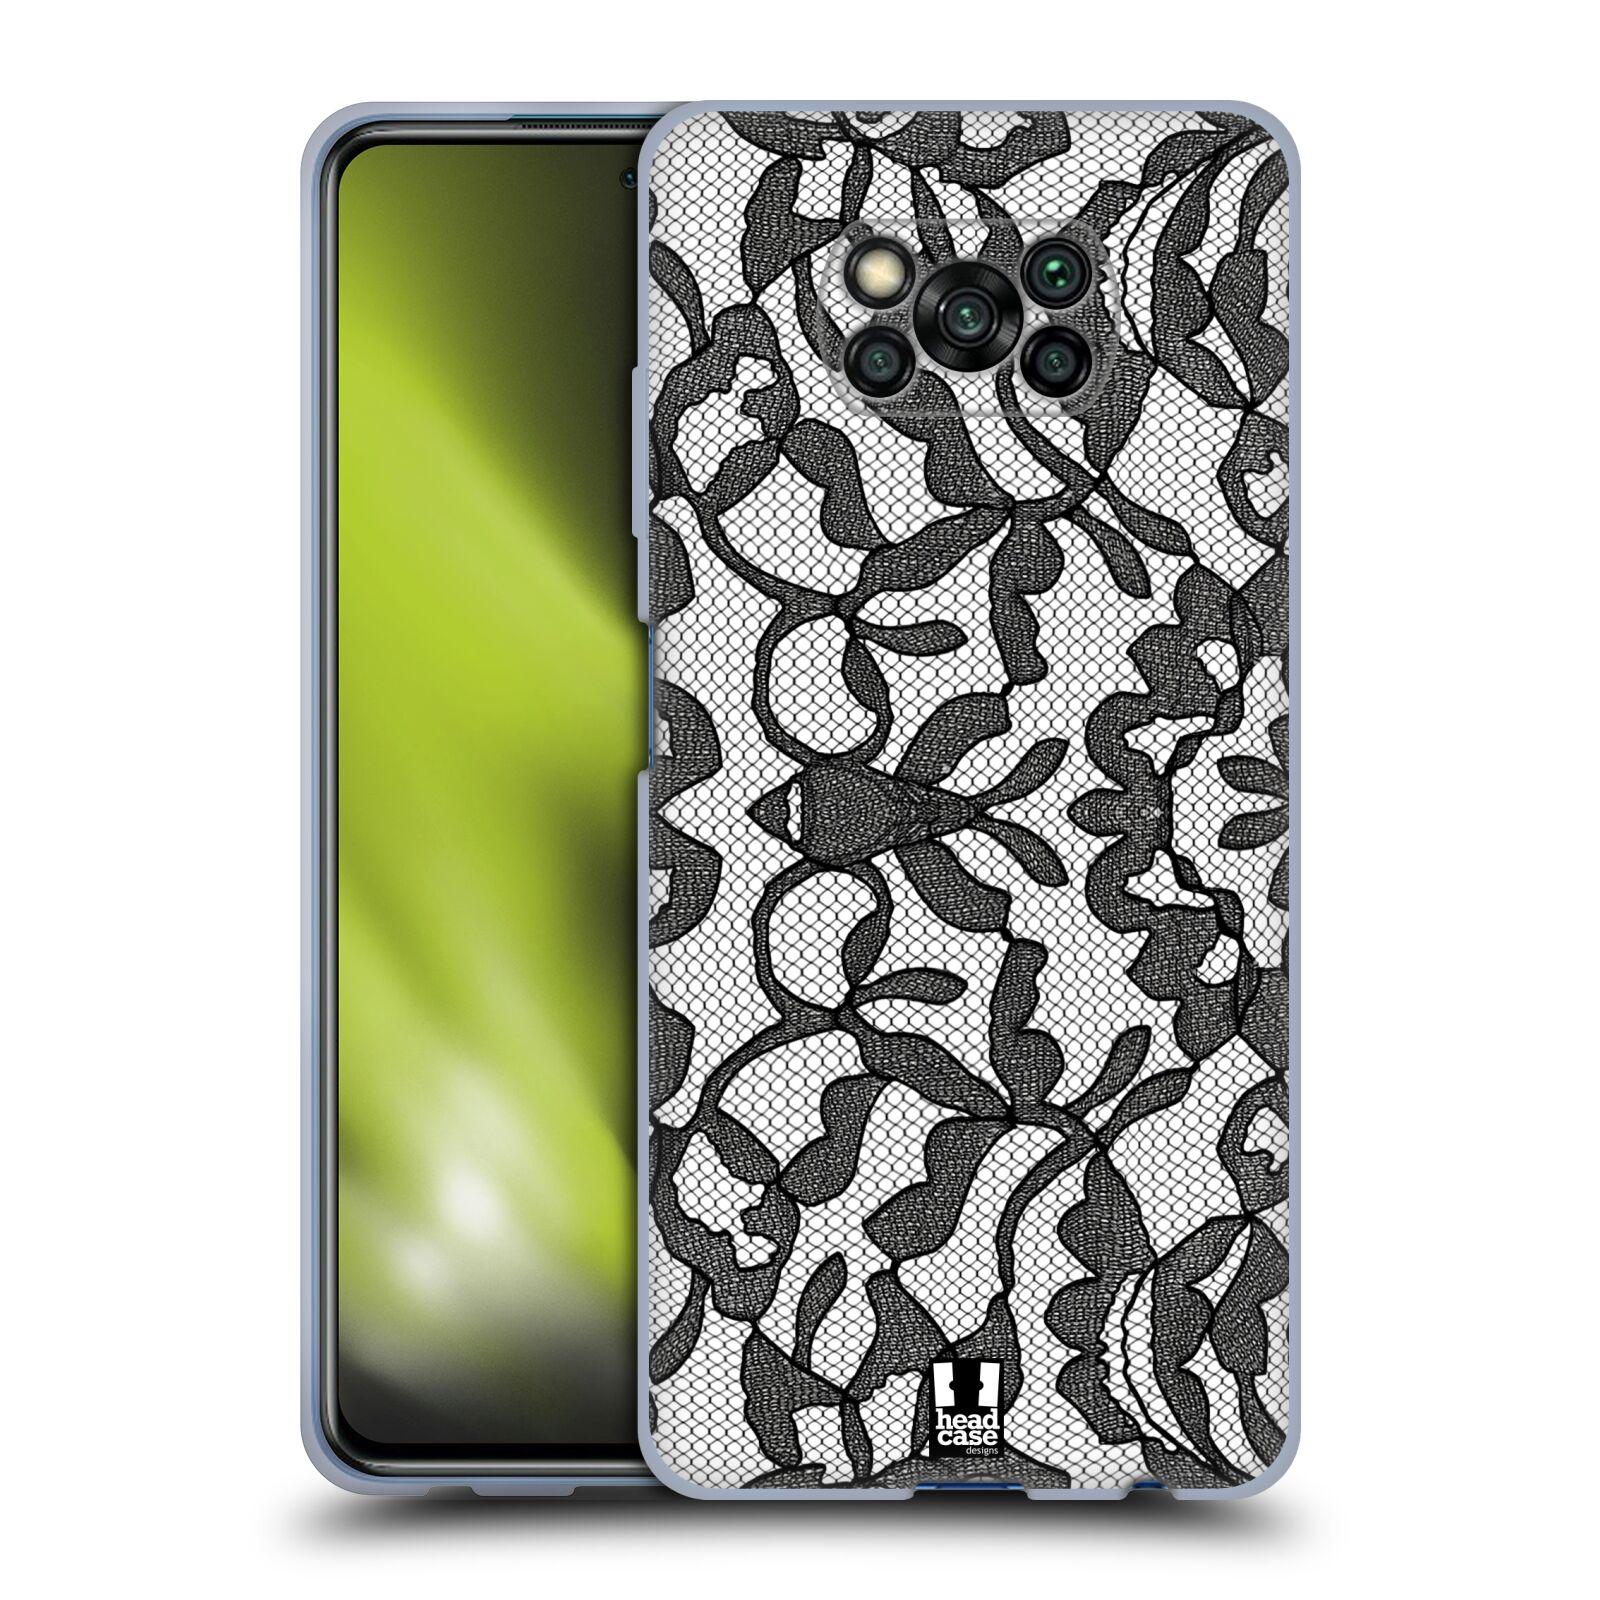 Silikonové pouzdro na mobil Xiaomi Poco X3 NFC - Head Case - LEAFY KRAJKA